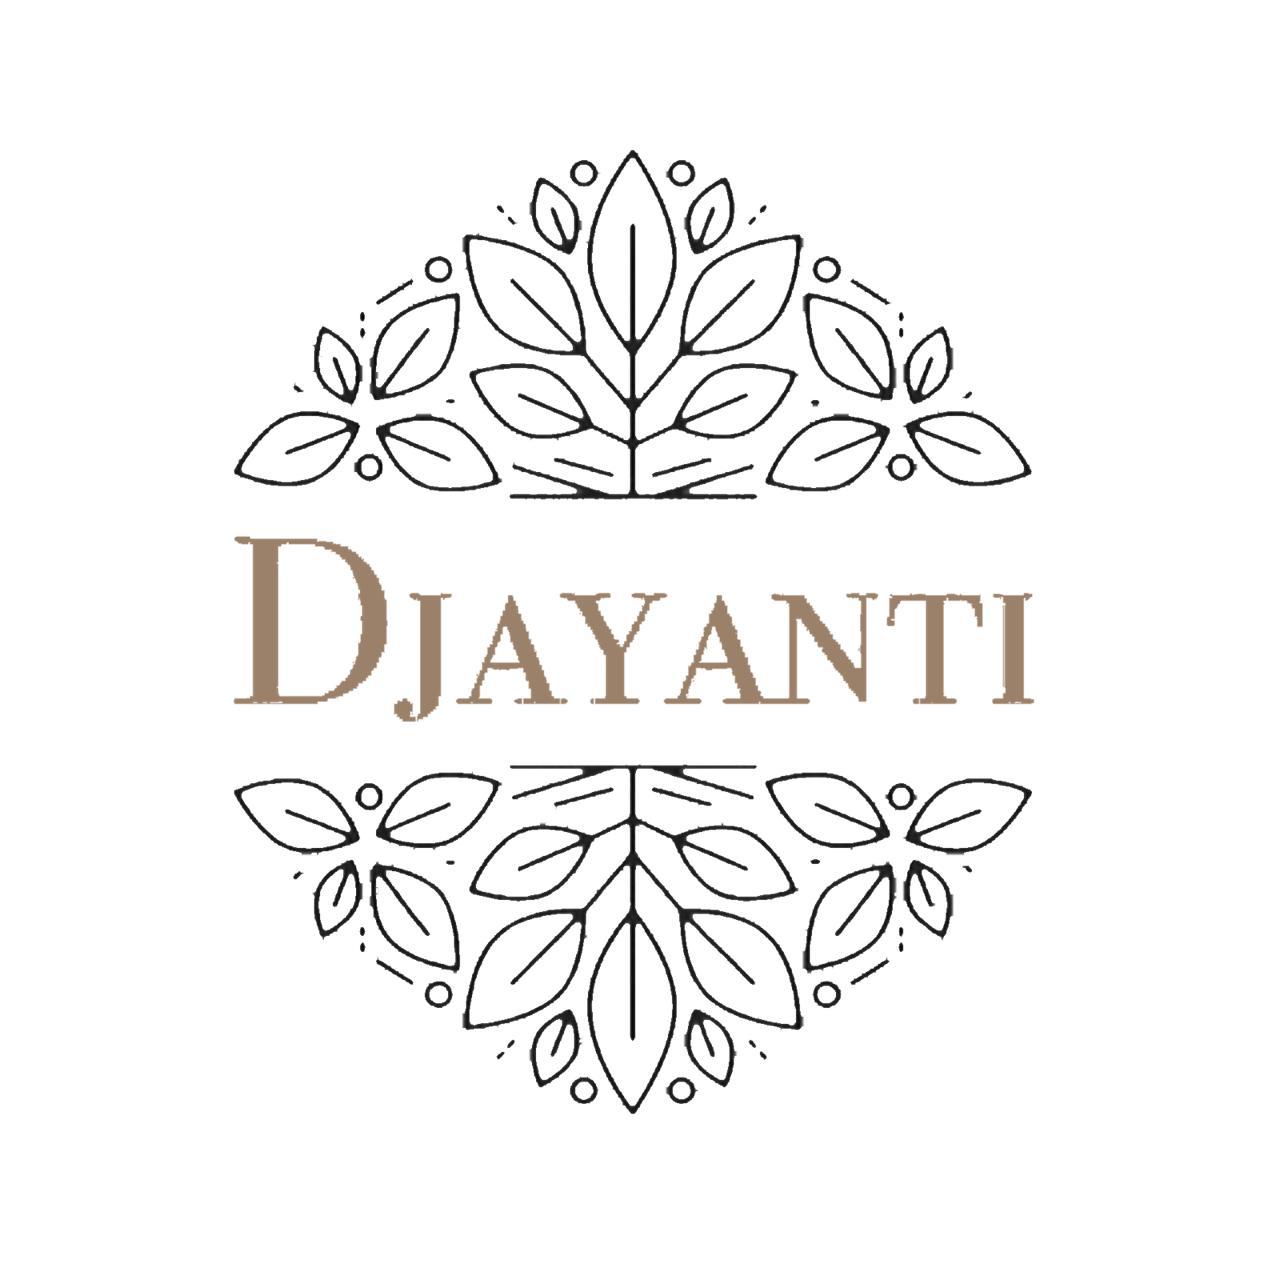 Djayanti